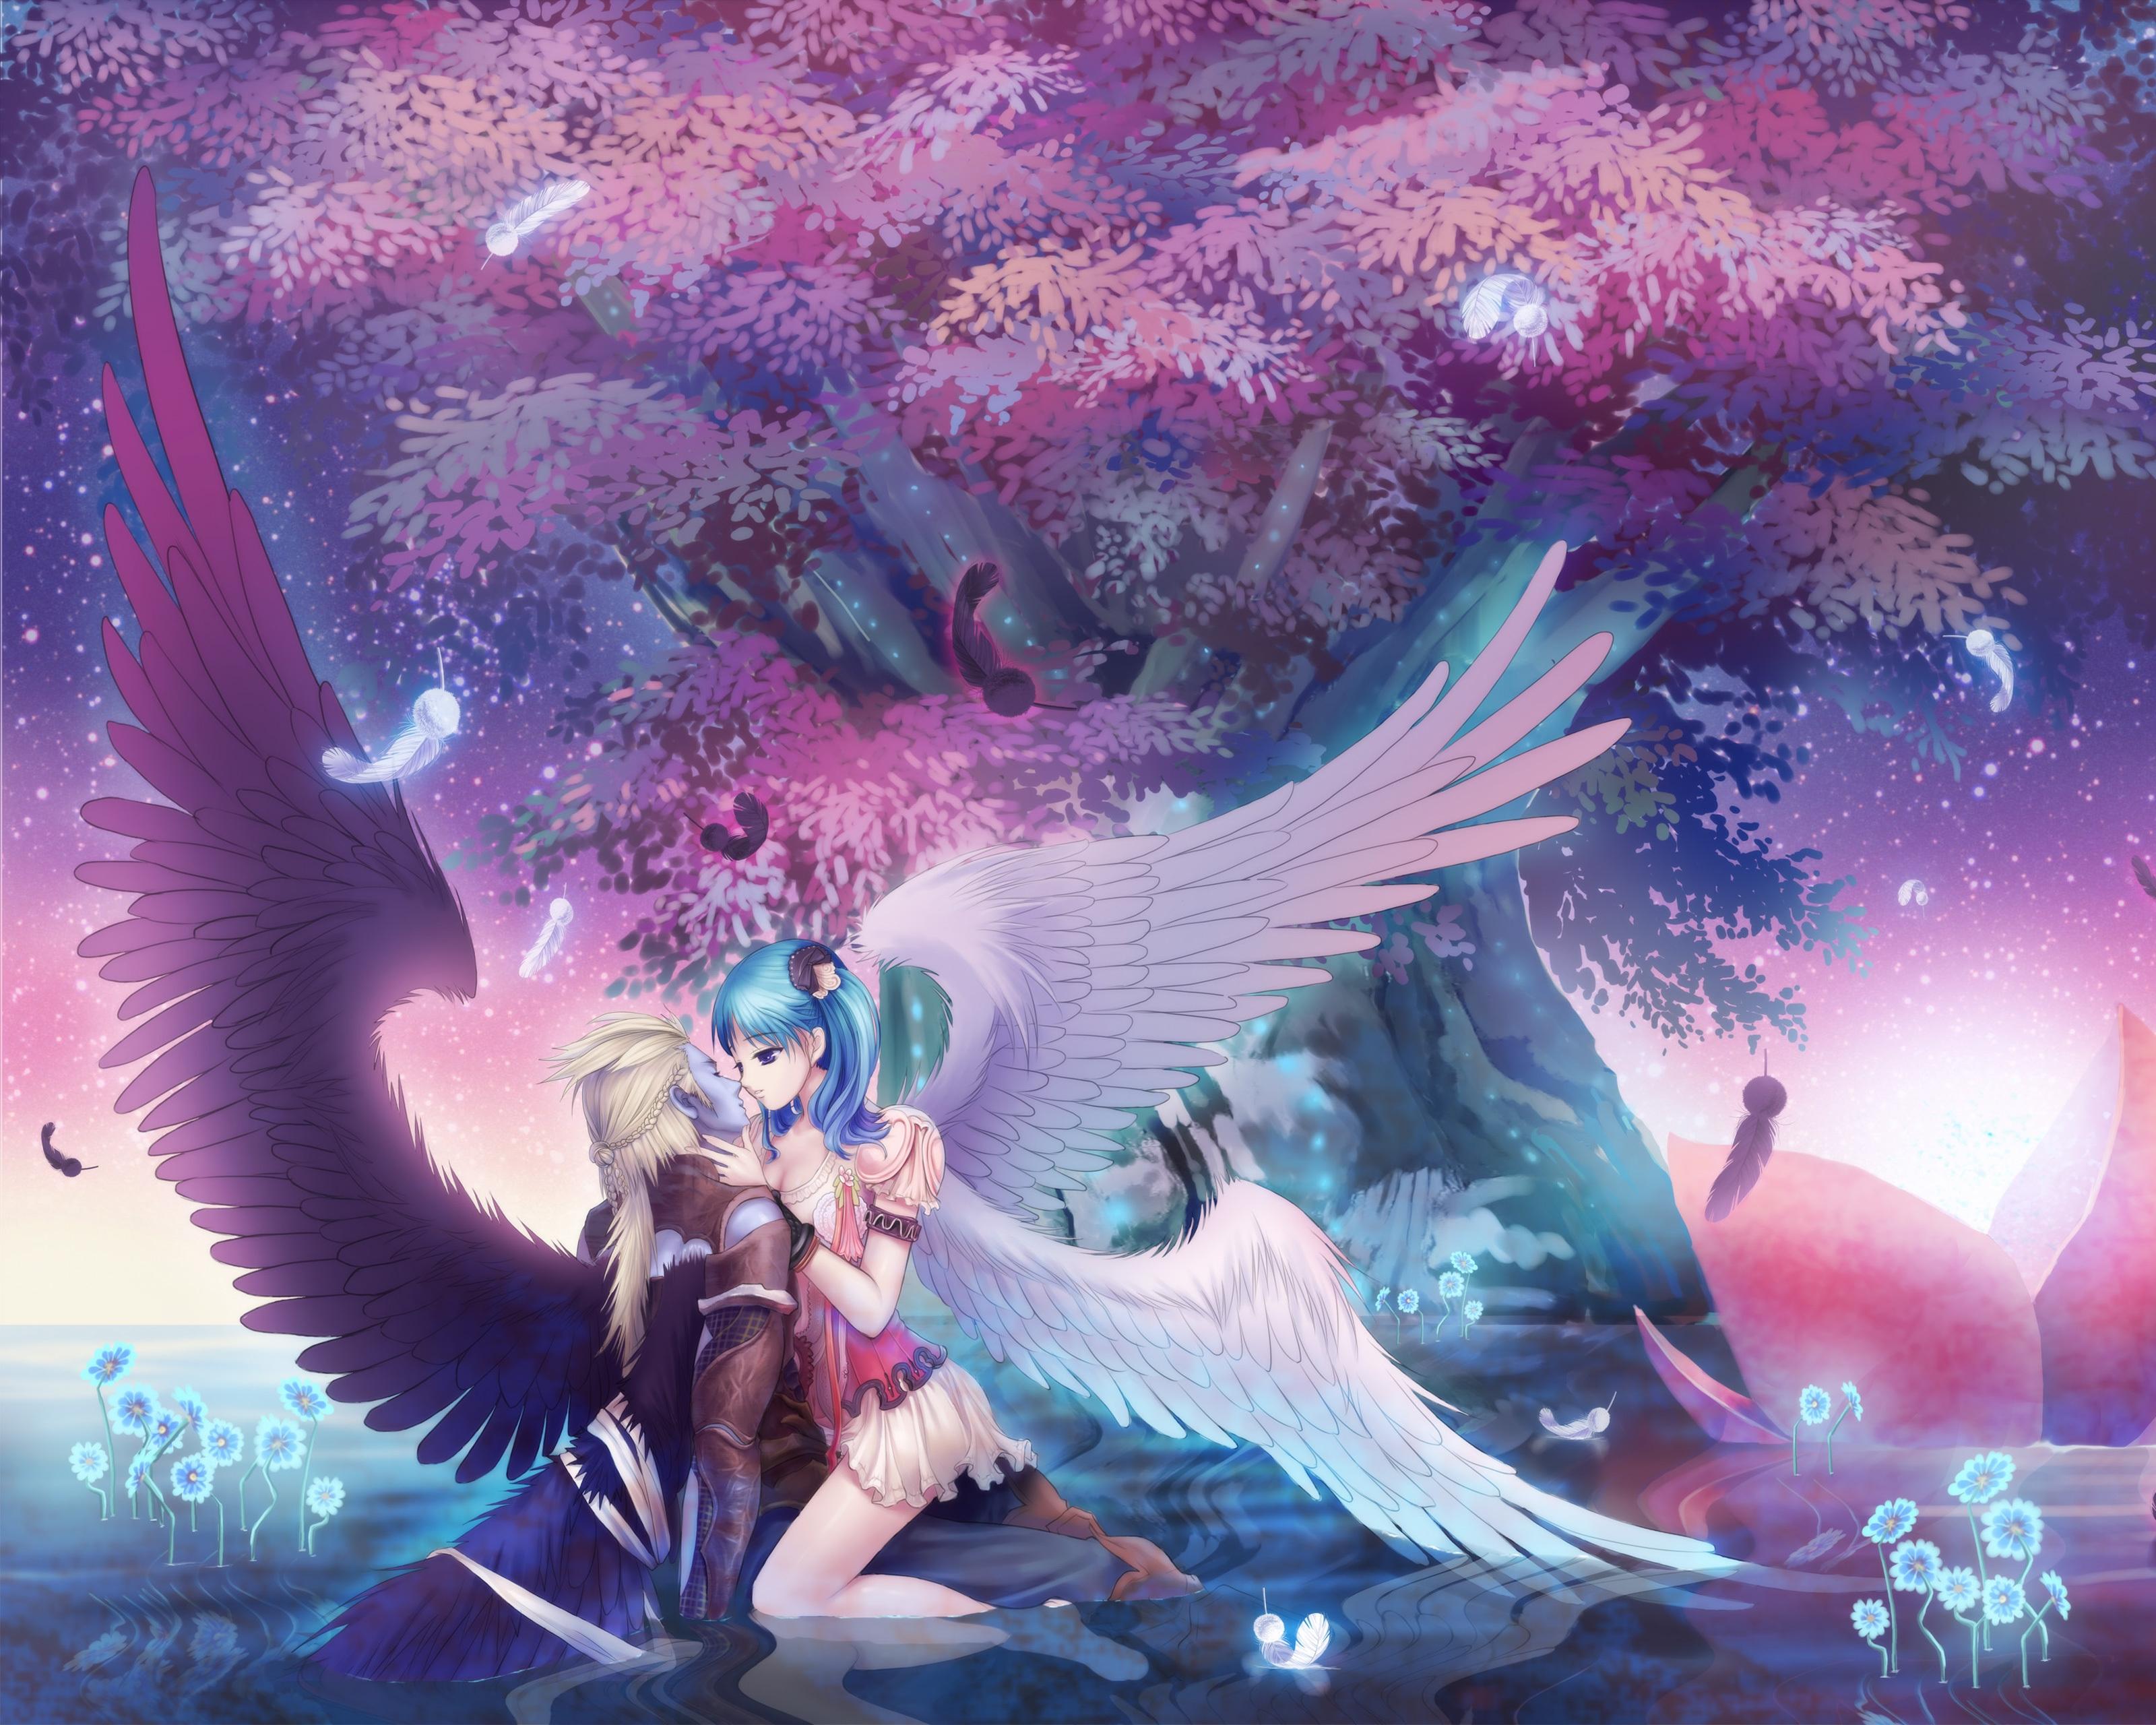 Wallpaper : girl, boy, angel, kiss, salvation, wings 10x10